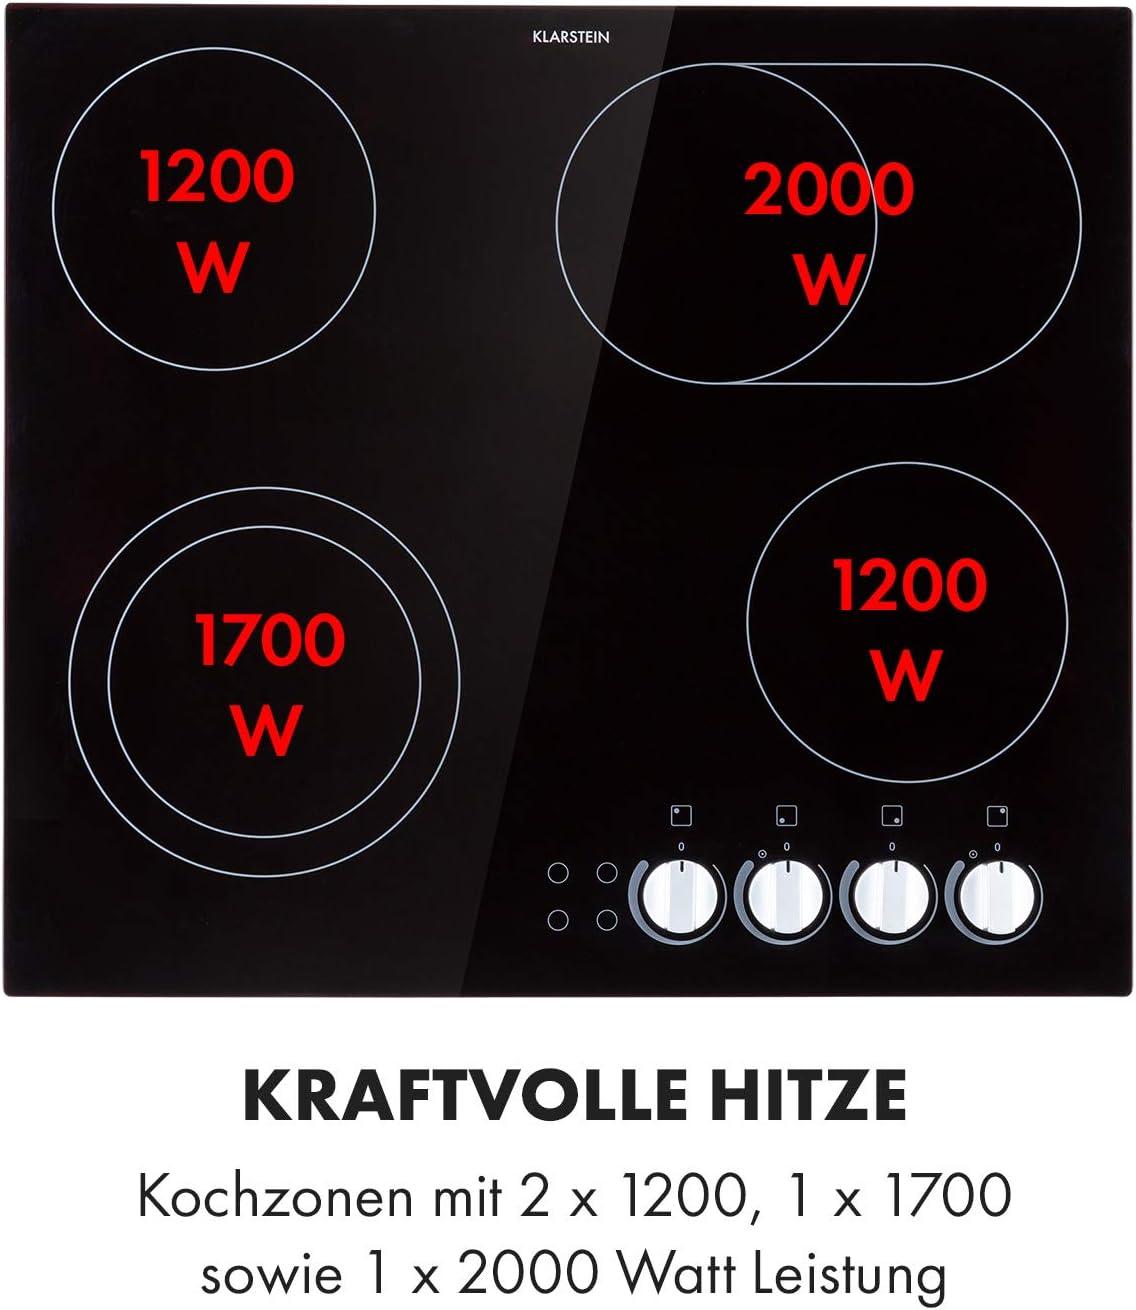 2 Zonen get/öntes Glas rahmenlos schwarz 3000 Watt Kontrollleuchten Klarstein EasyCook Domino Keramikkochfeld 29 cm stufenlose Drehregler Einbaukochfeld